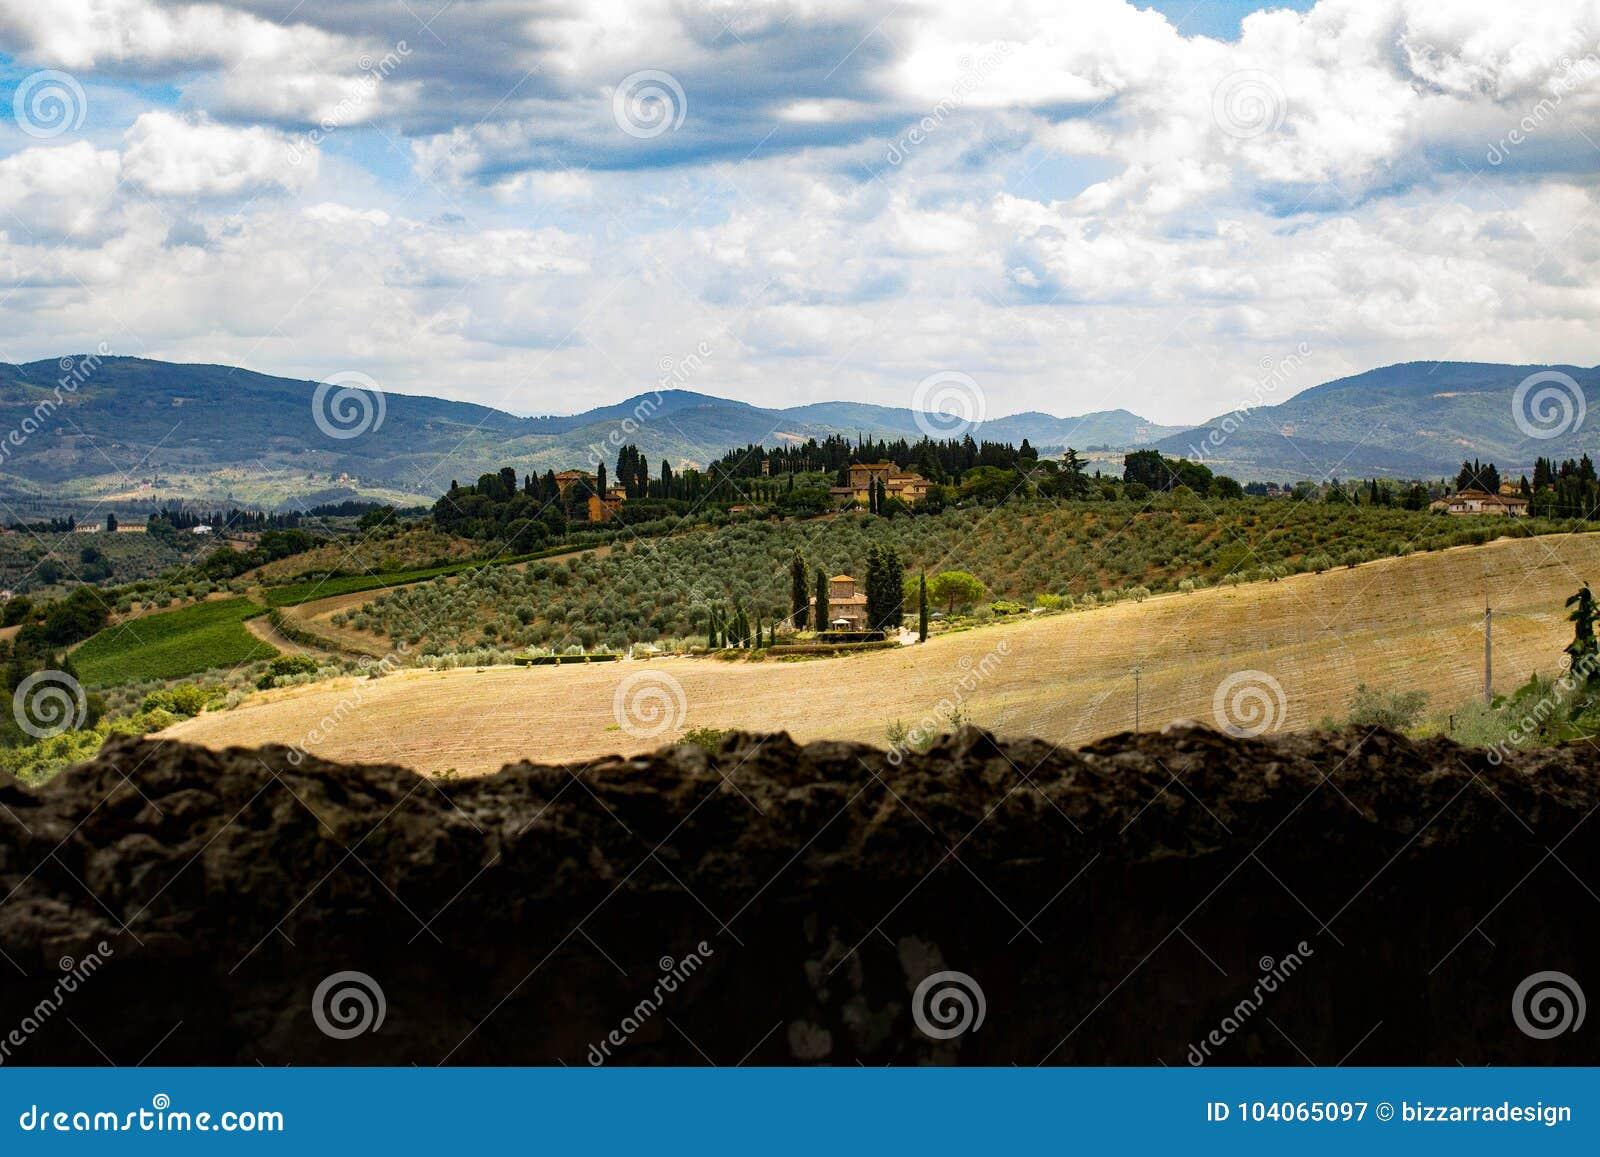 Tuscany country landscape from Impruneta